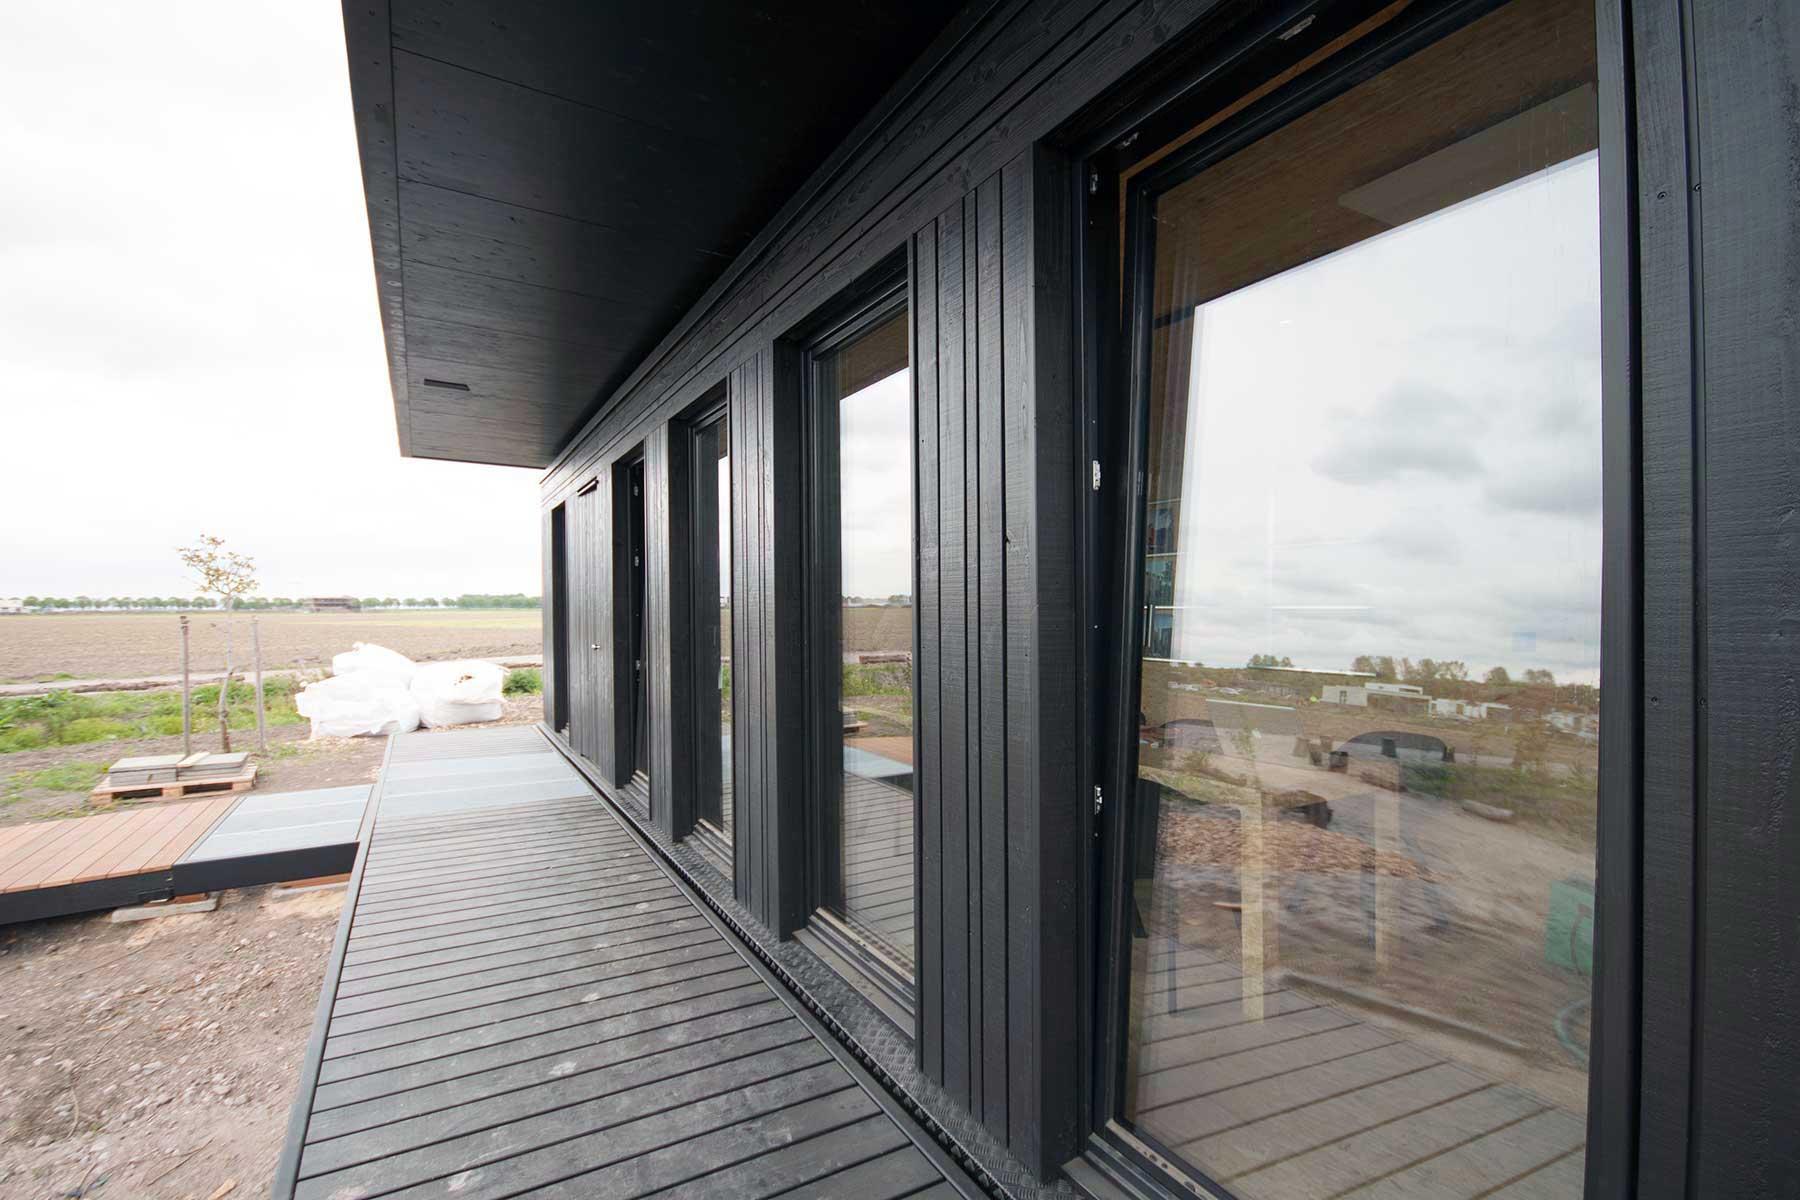 8A-Architecten-Oosterwold-paviljoen-05